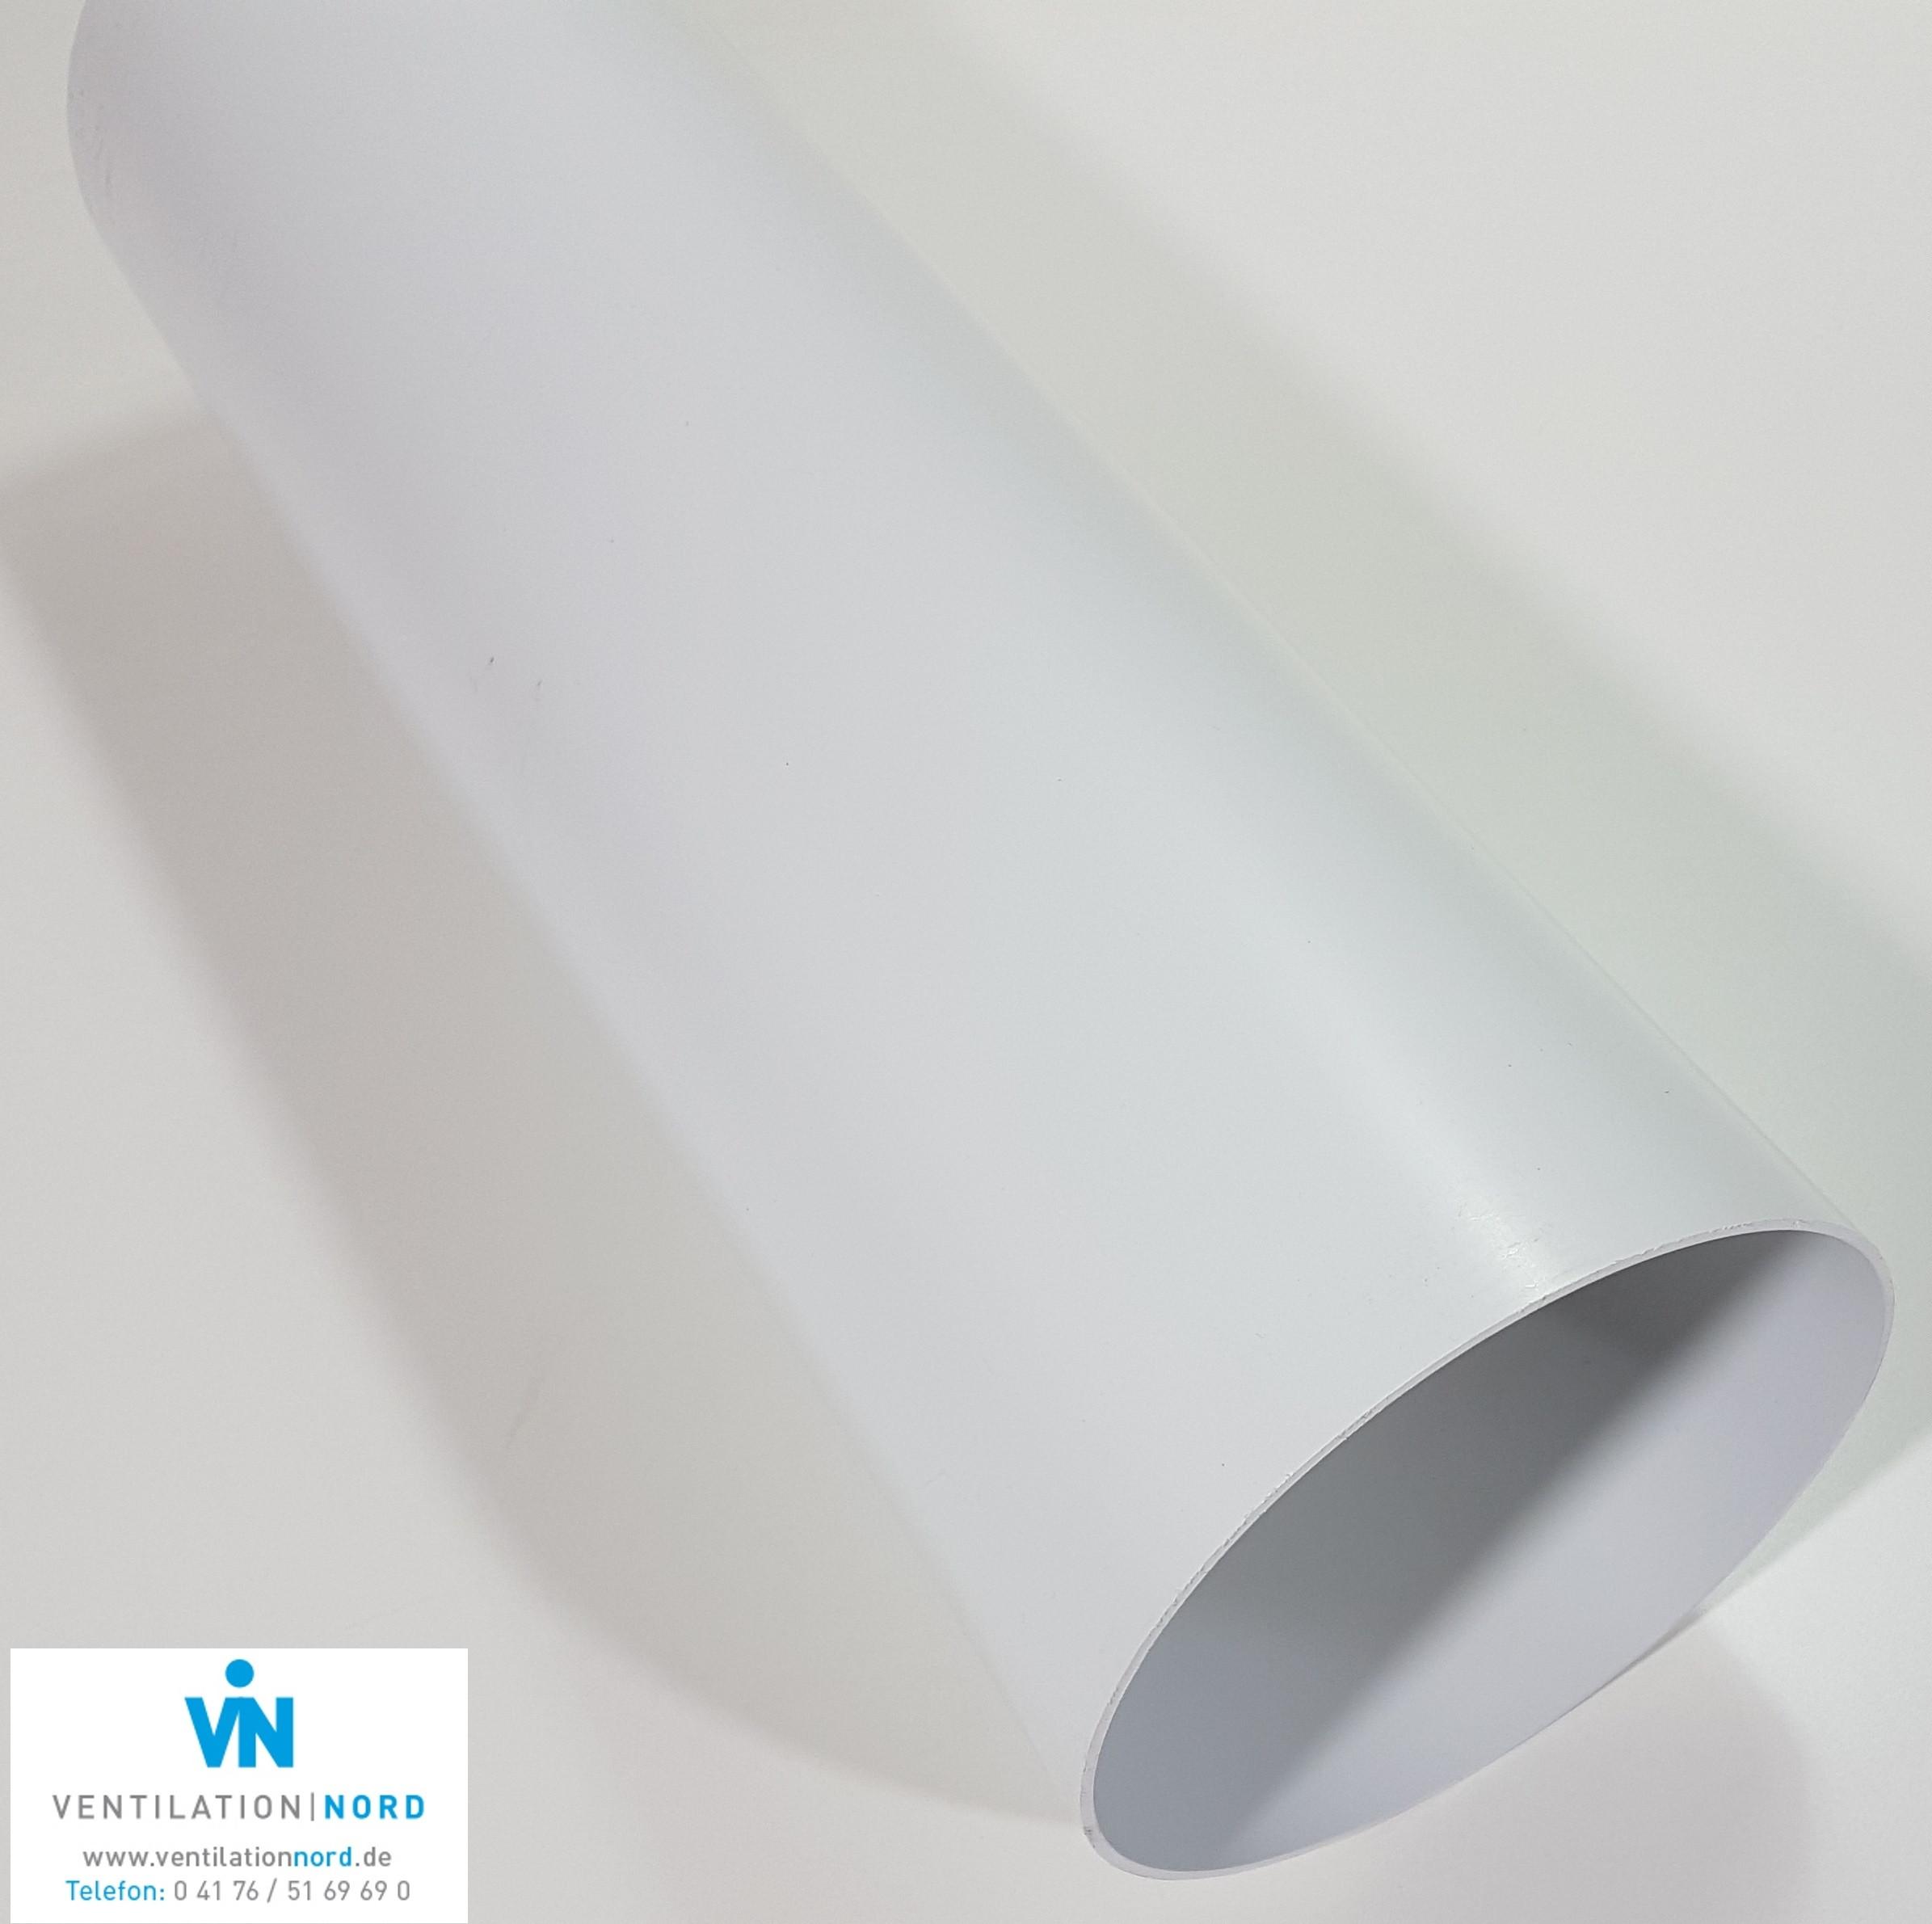 kunststoffrohr abluft zuluft z b f r dunstabzug 100 125 150 0 5m lang flachkanal rohr. Black Bedroom Furniture Sets. Home Design Ideas